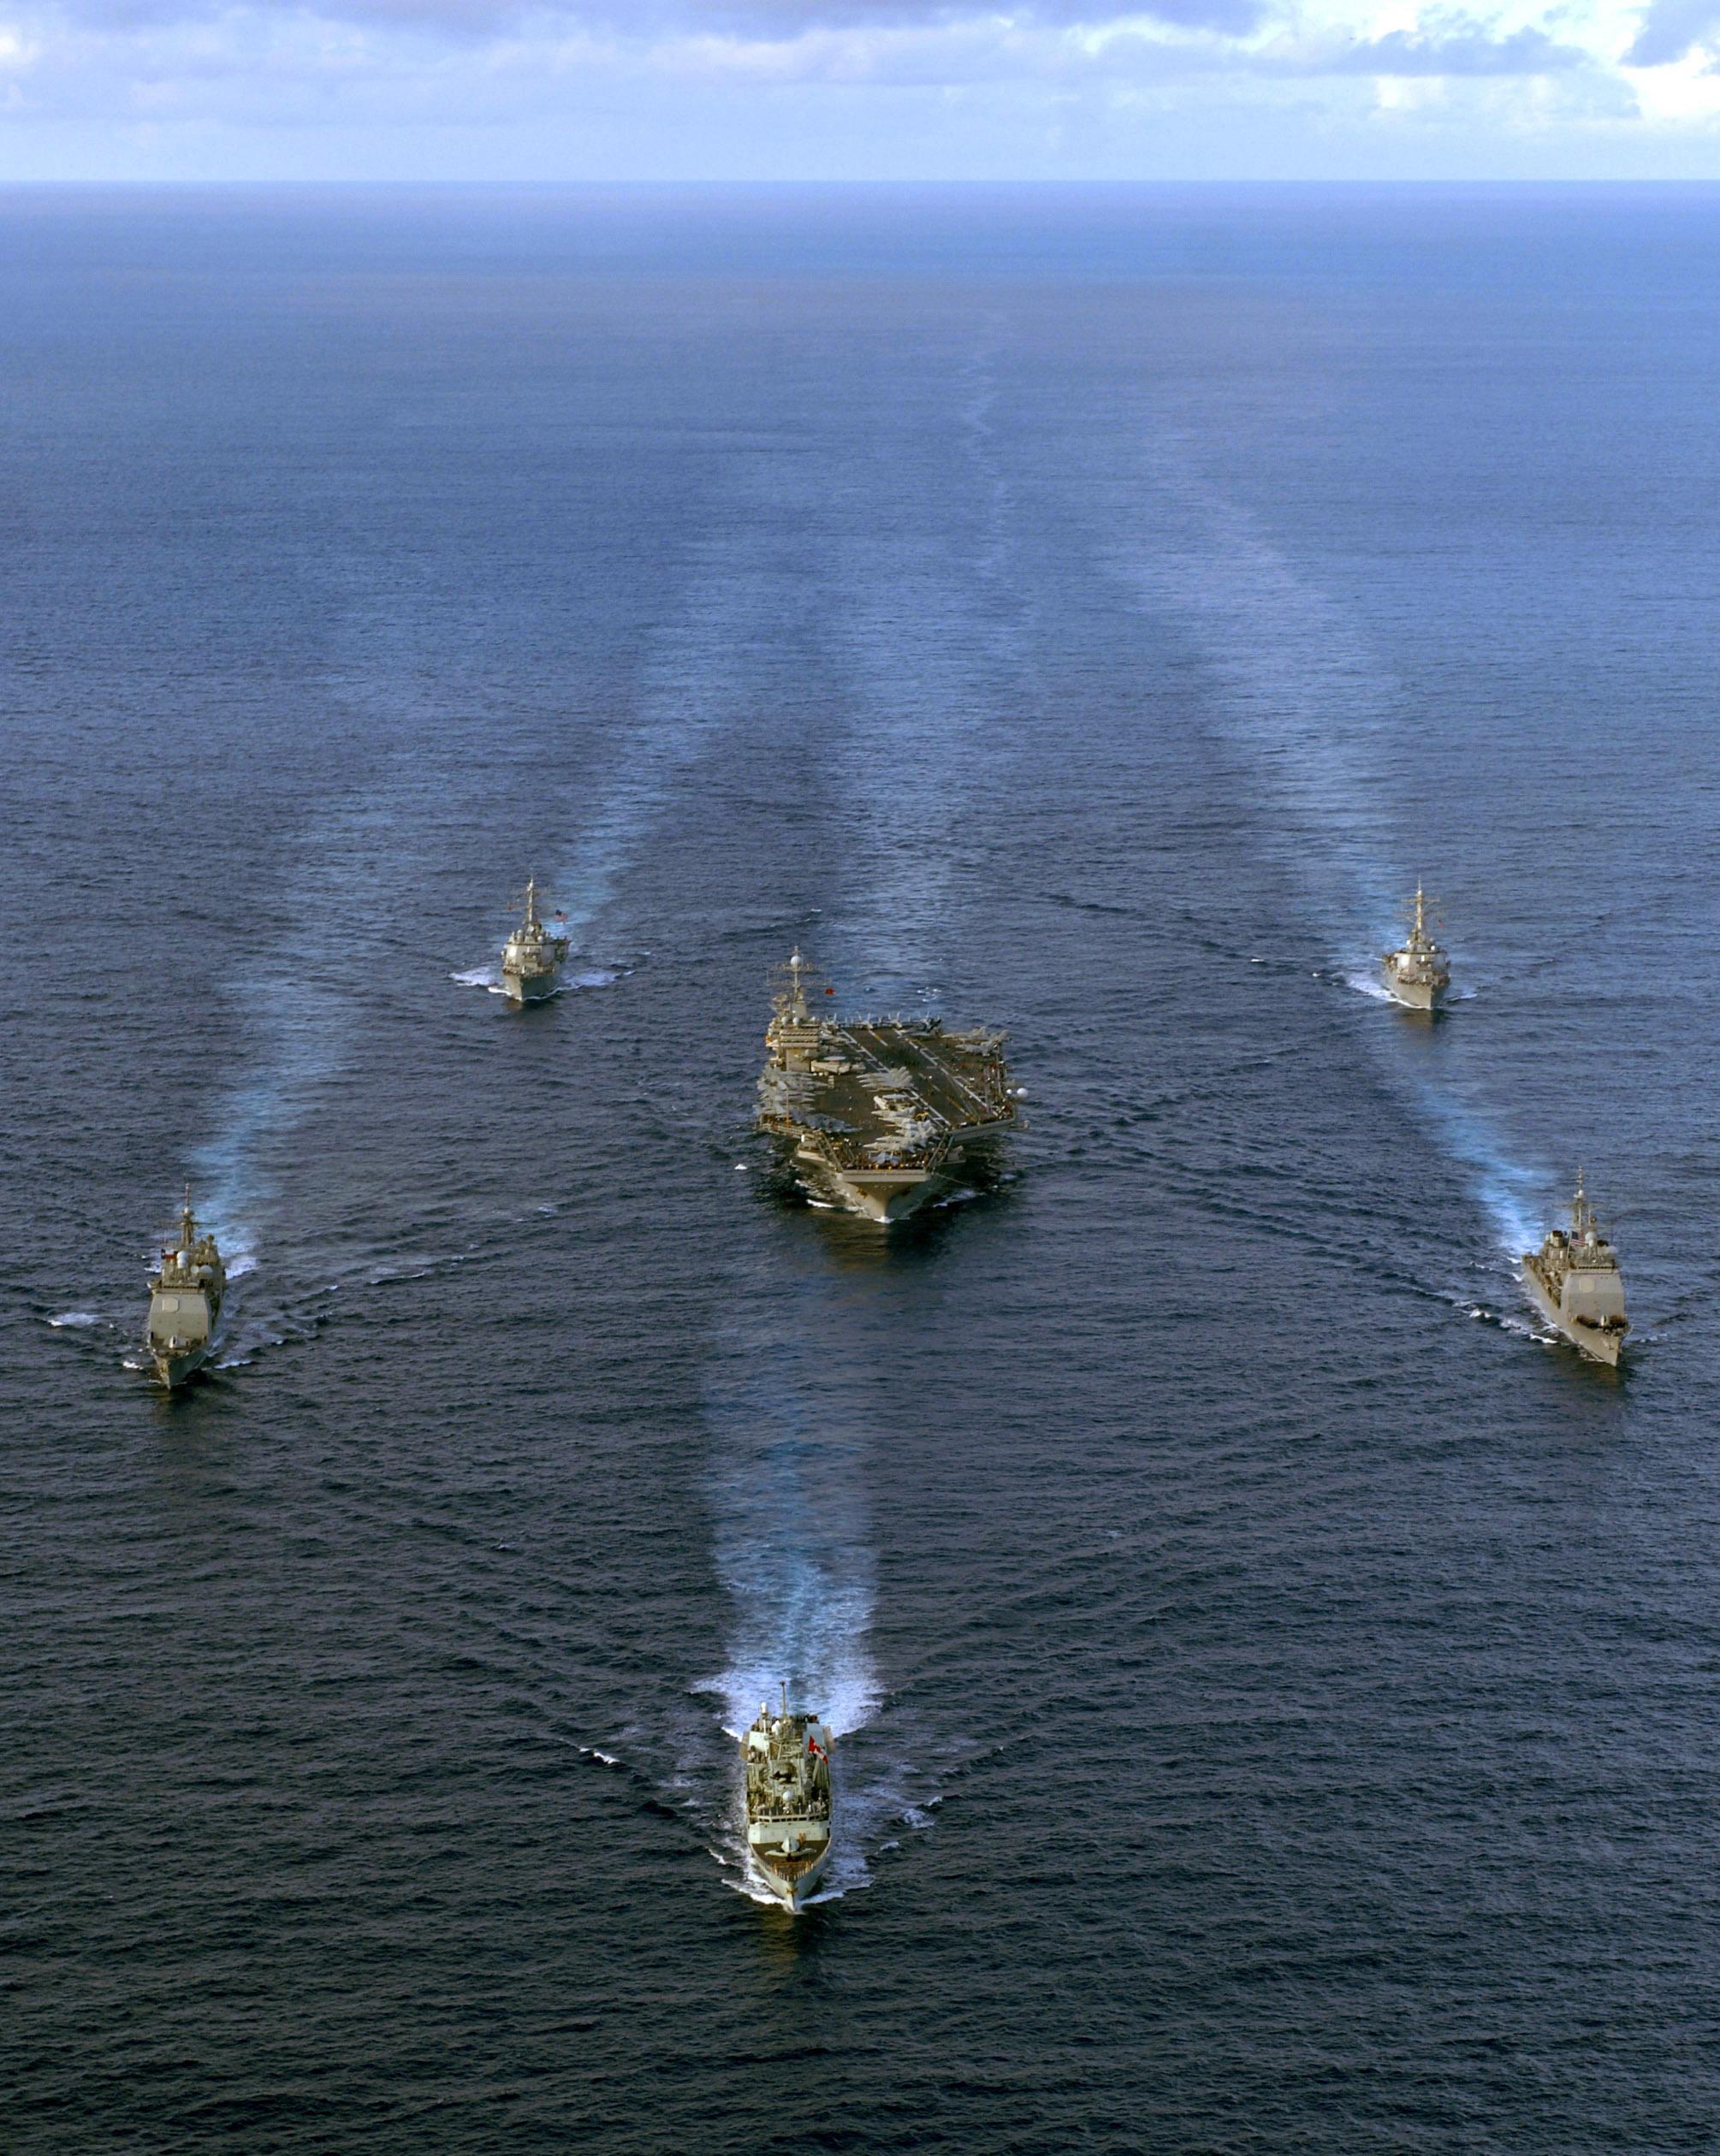 Carrier Strike Group Ten 18